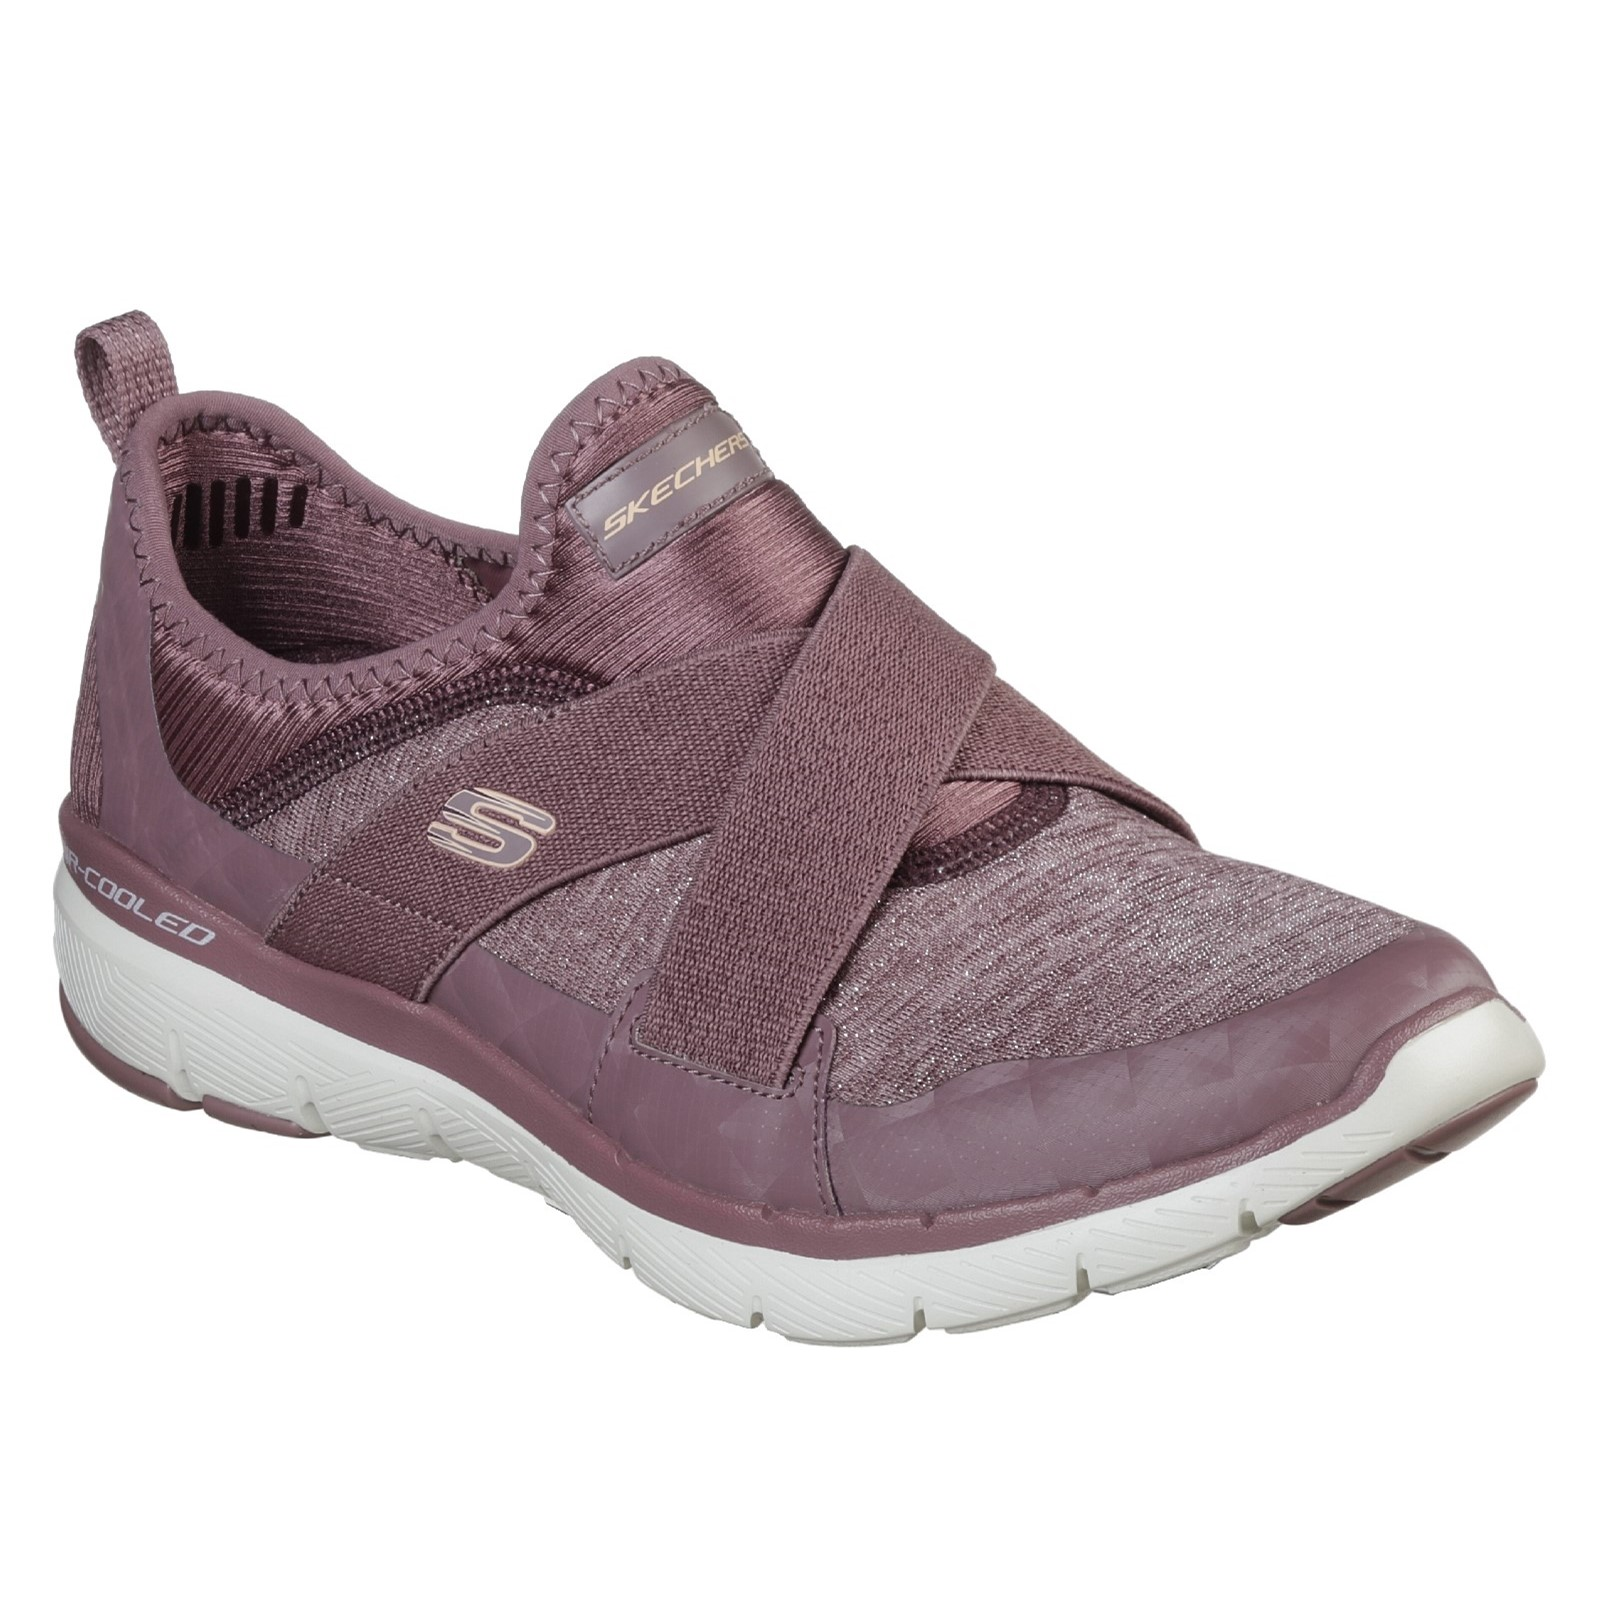 Skechers Womens Flex Appeal 3.0 Finest Hour shoes